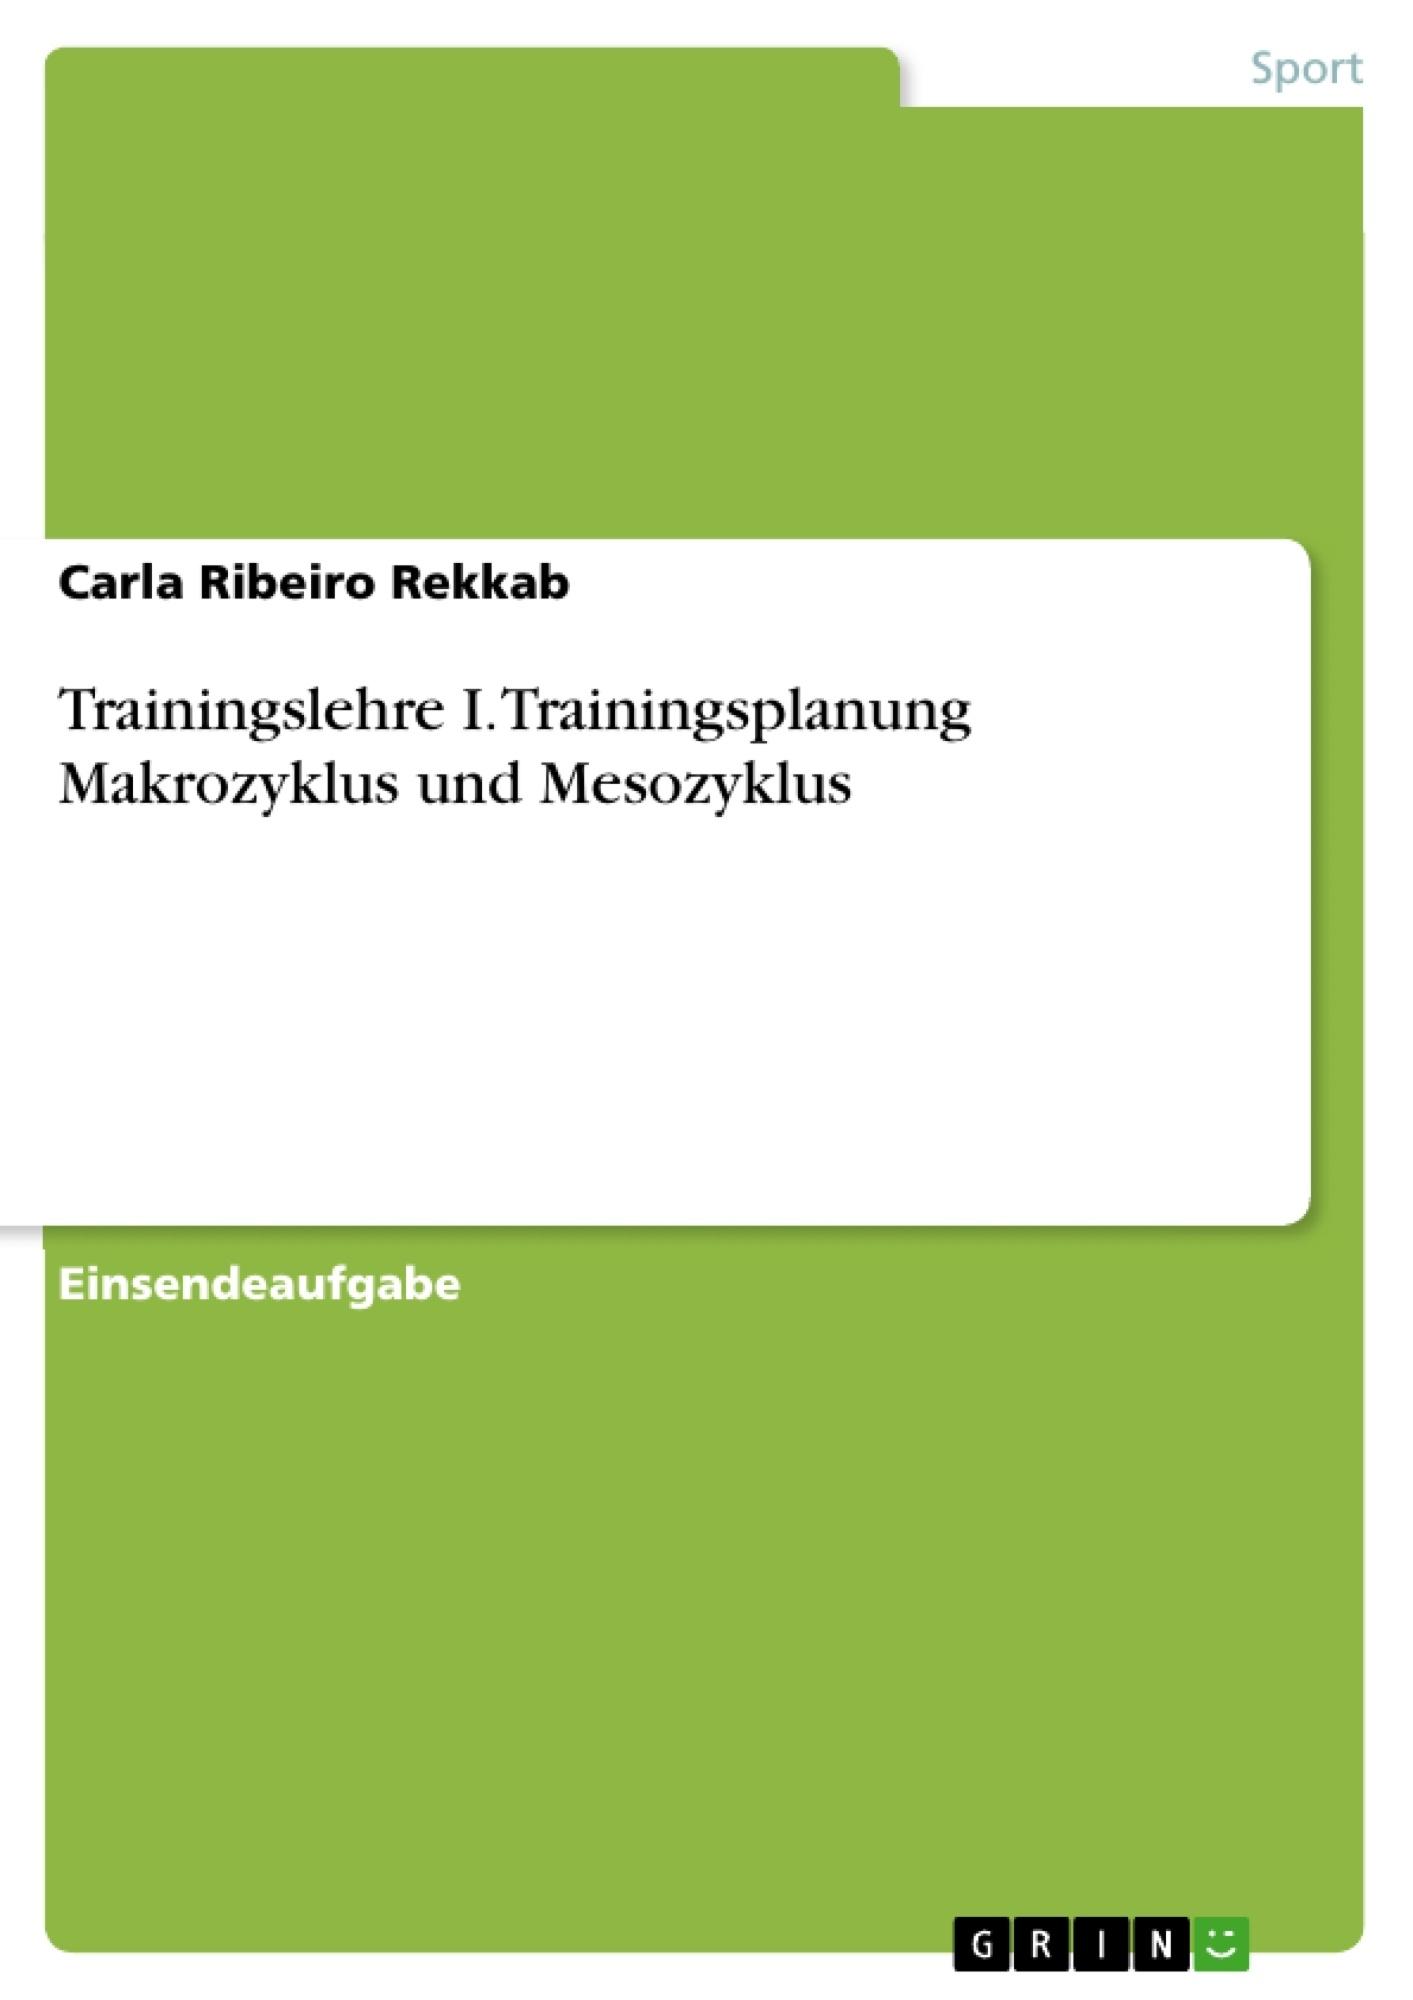 Titel: Trainingslehre I. Trainingsplanung Makrozyklus und Mesozyklus